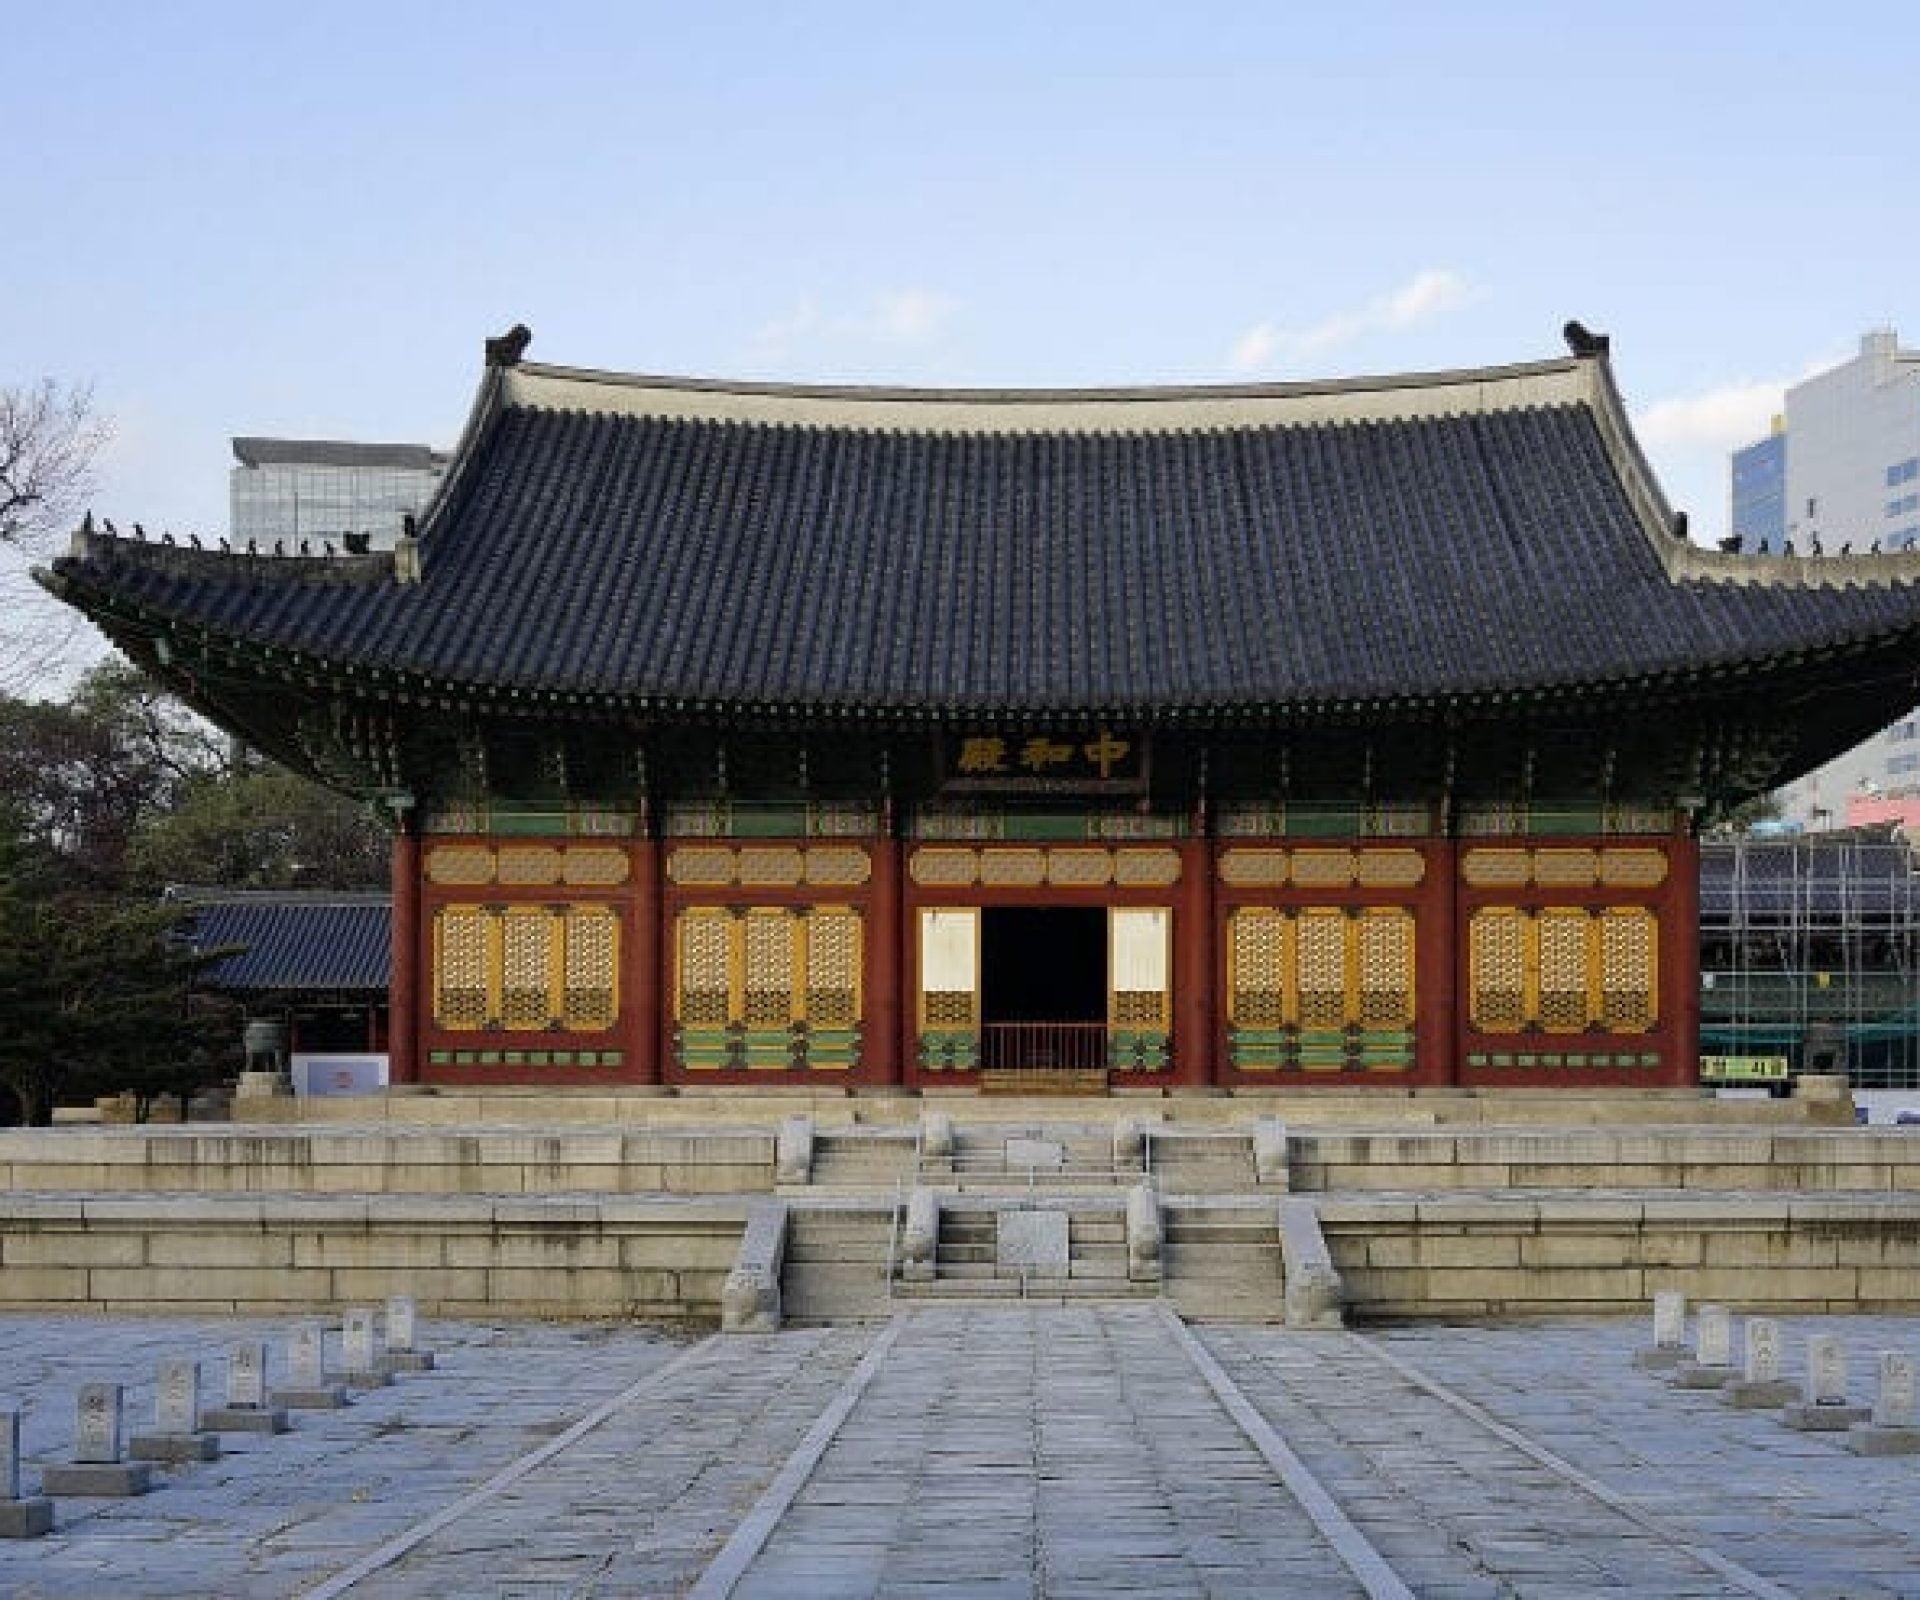 Deoksugung Palace | Jung-gu, Seoul